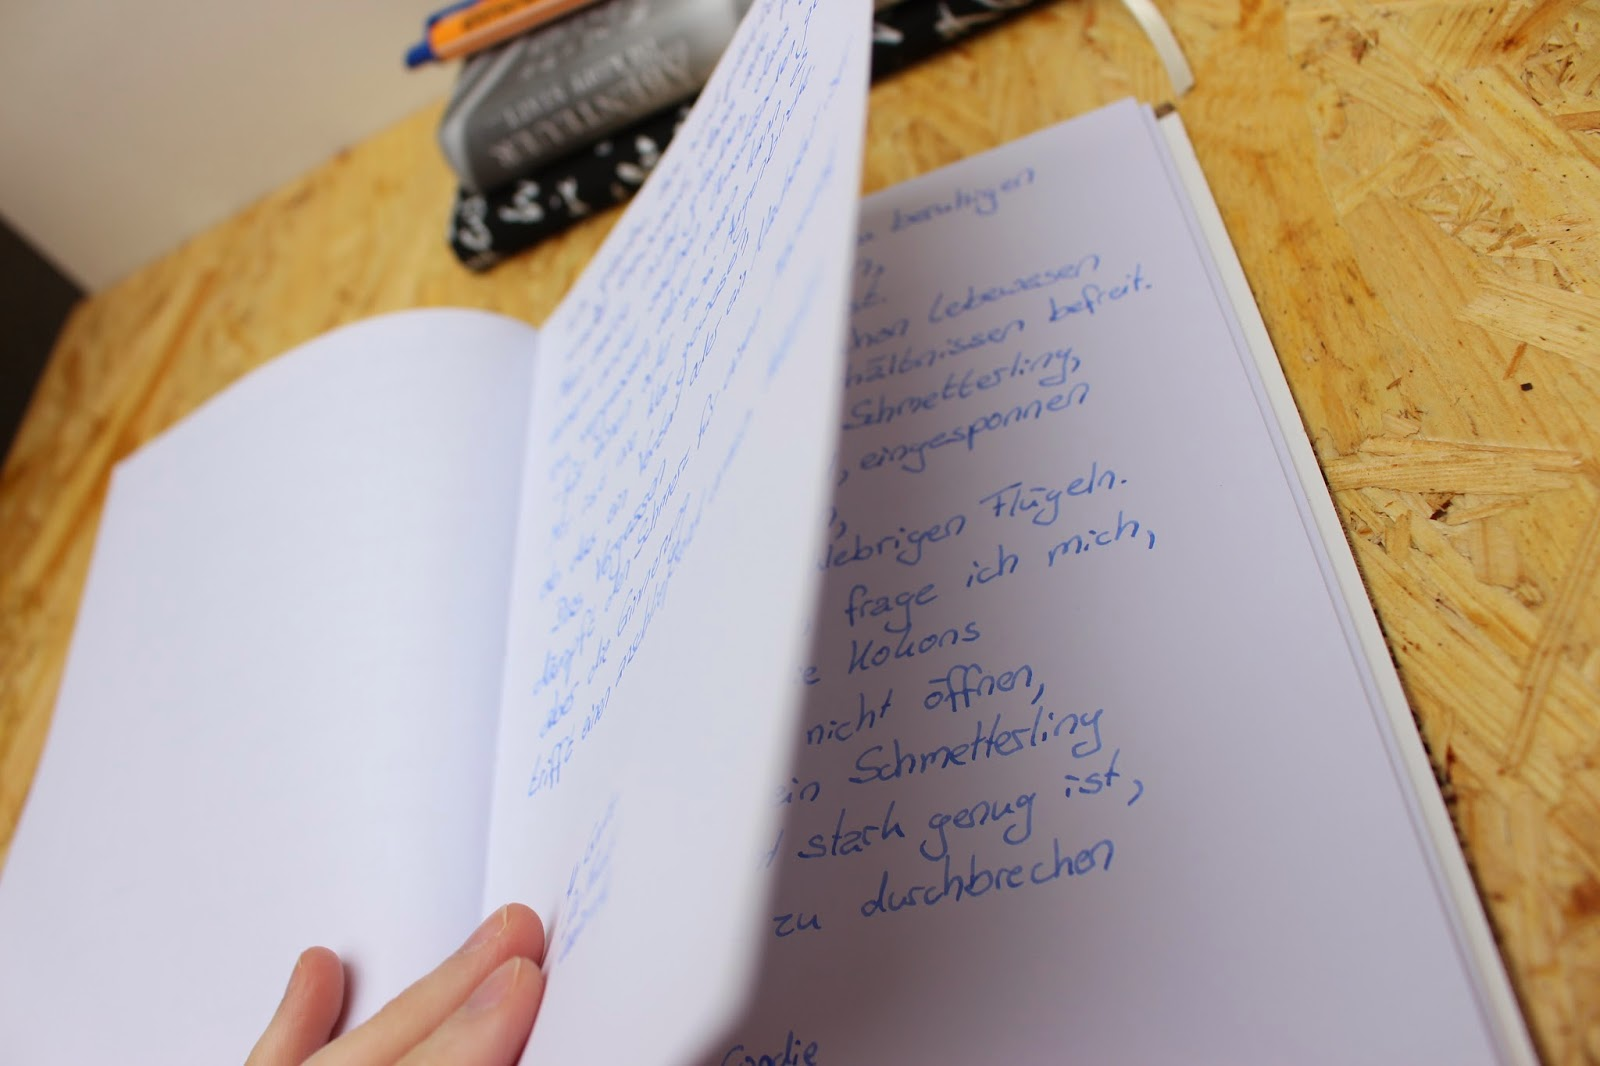 Zitatebuch, Buchzitate, Zitate, Buch